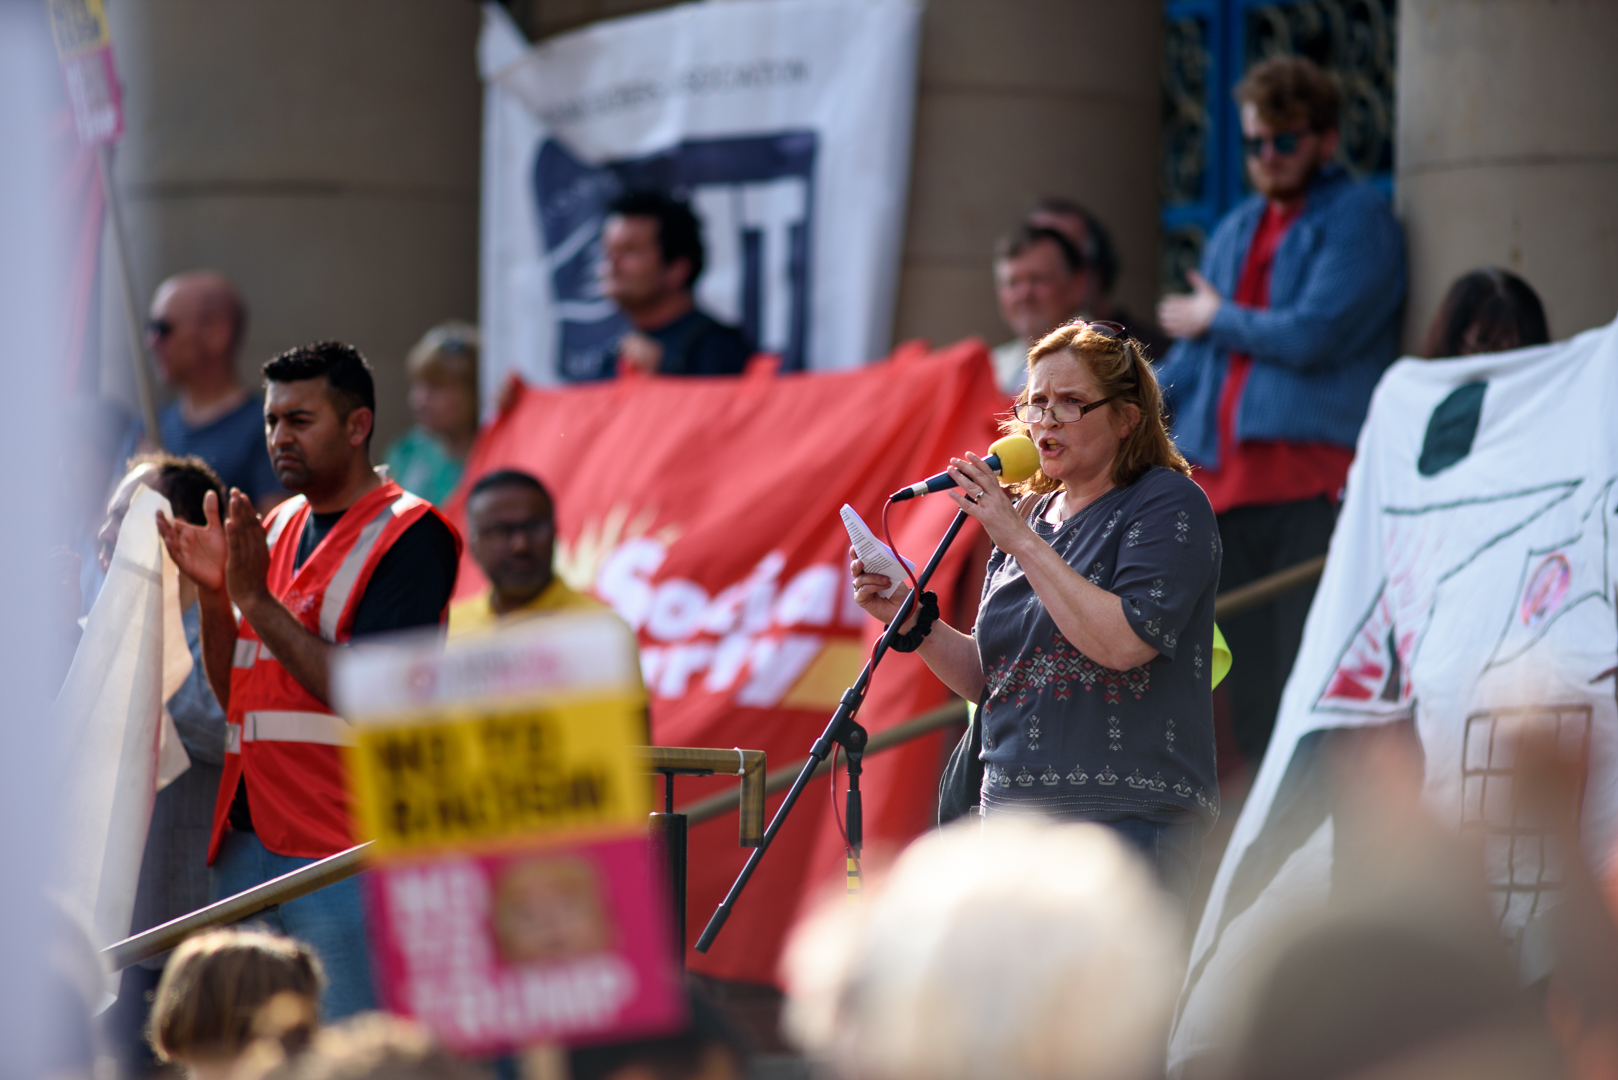 Sheffield Anti-Trump rally July 2018 Blog08.jpg